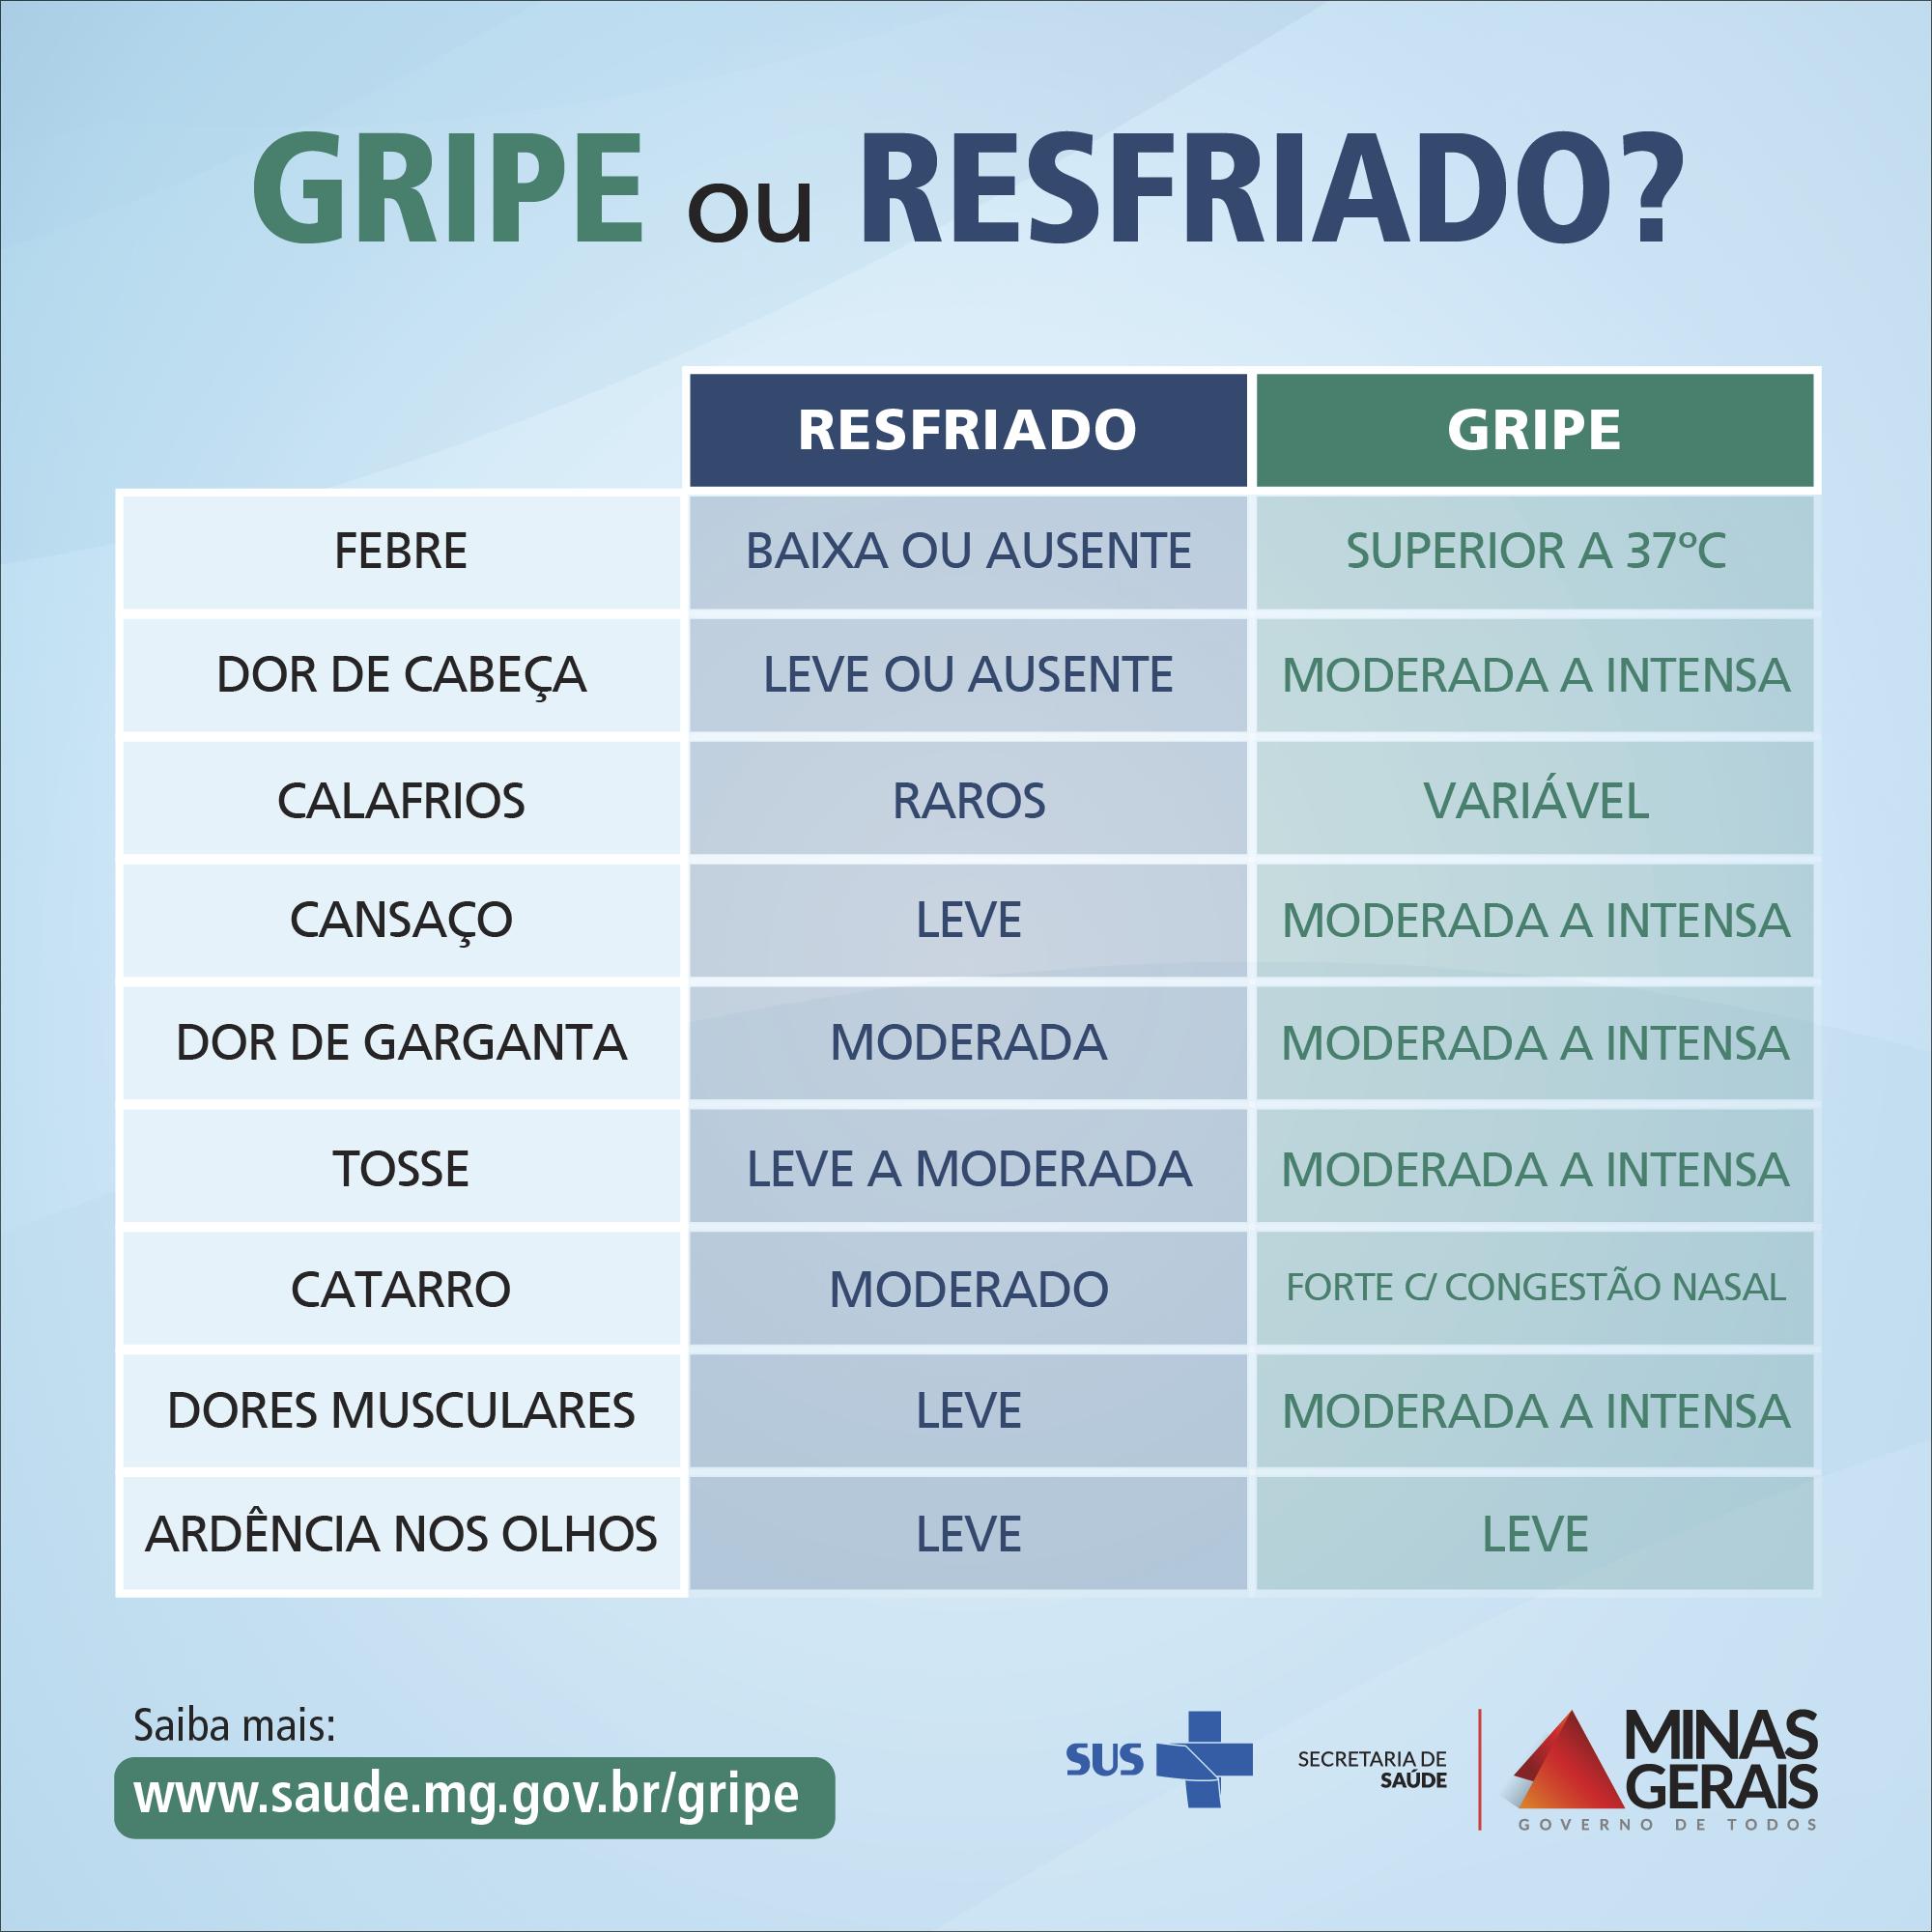 Vacine-se contra a Gripe - dia 16 de abril